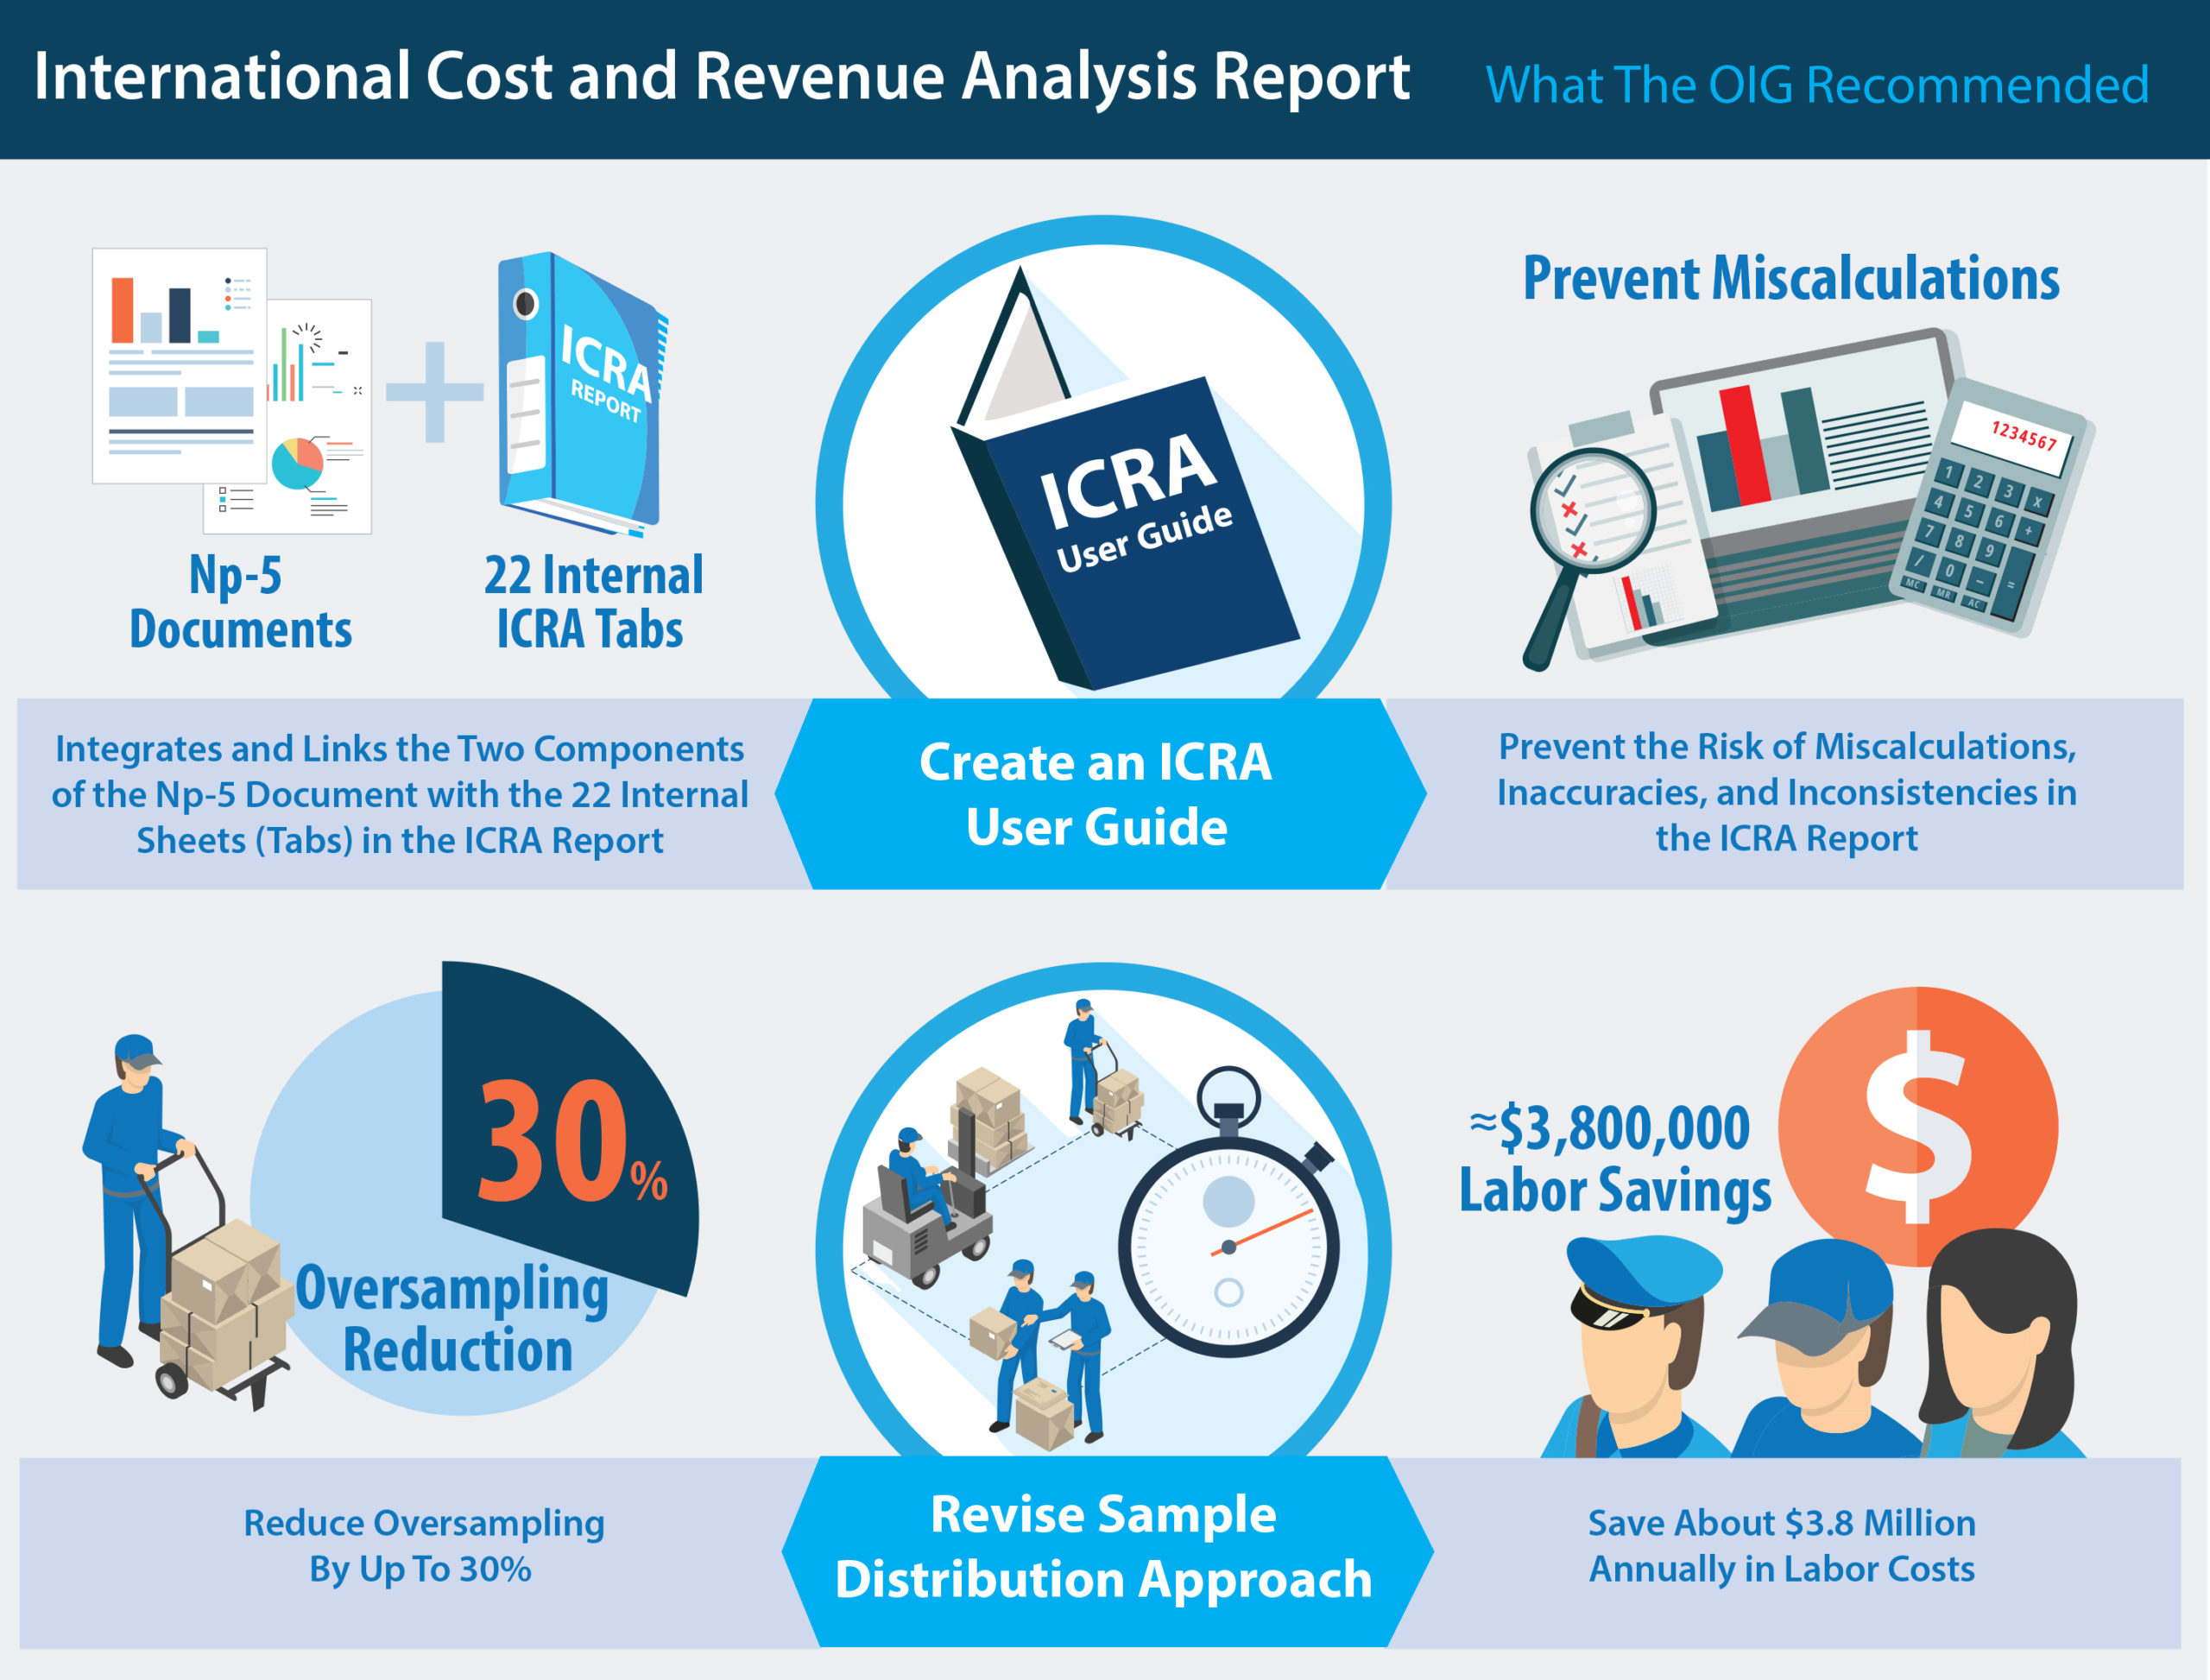 ICR Analysis Report